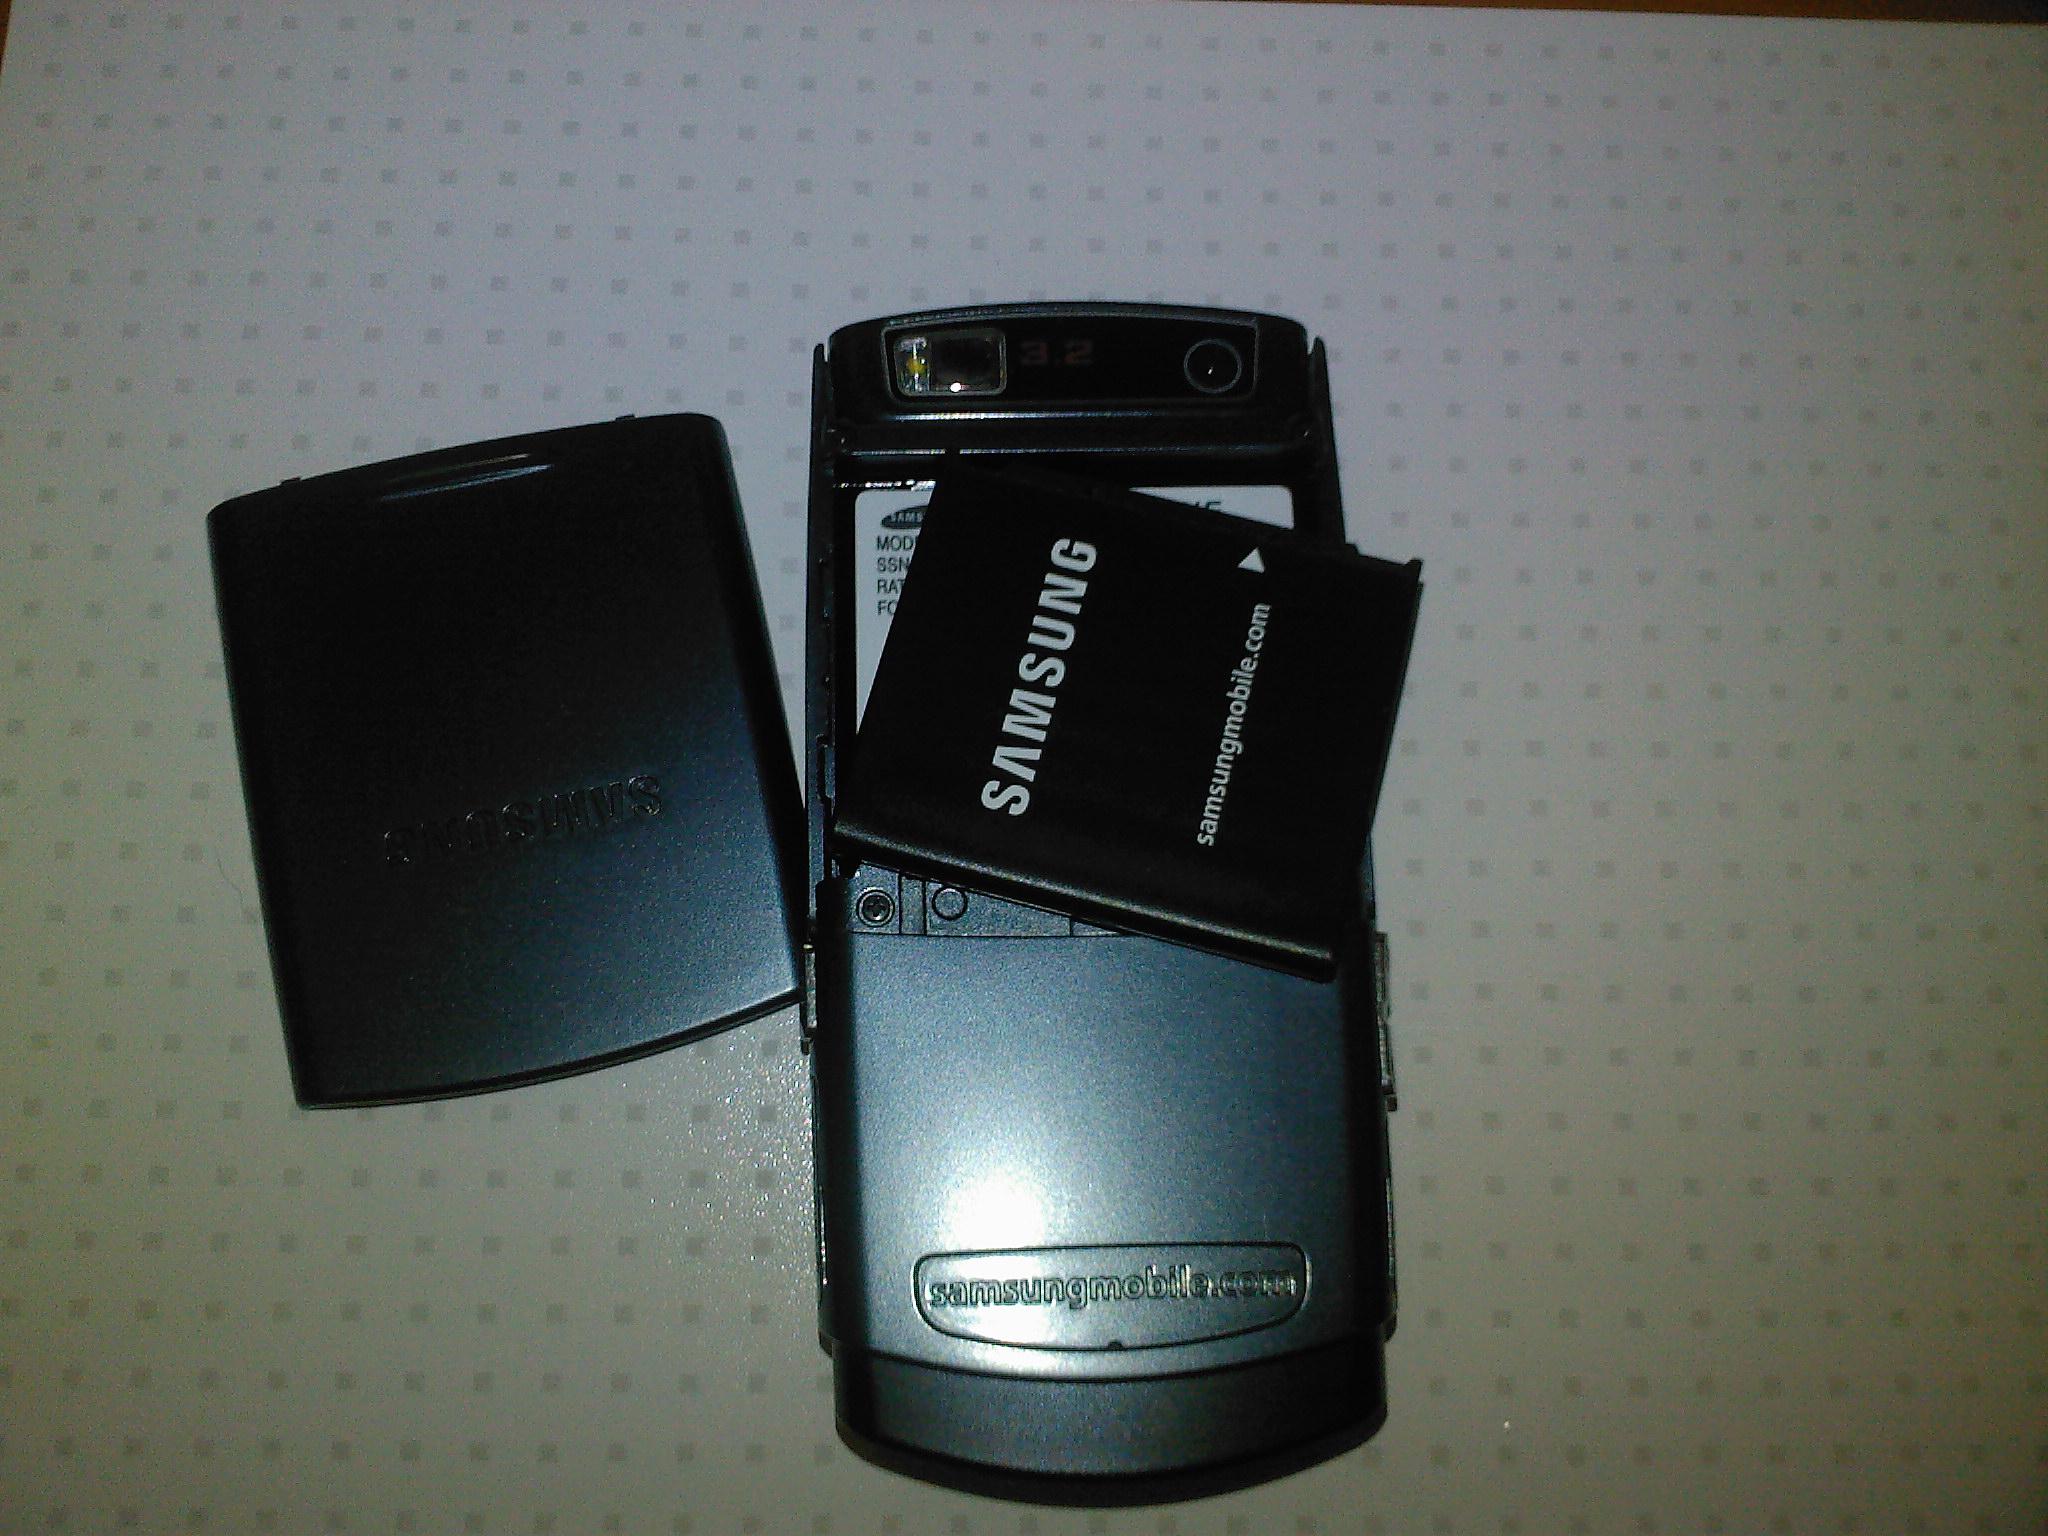 Samsung SGH-U600 increase battery life